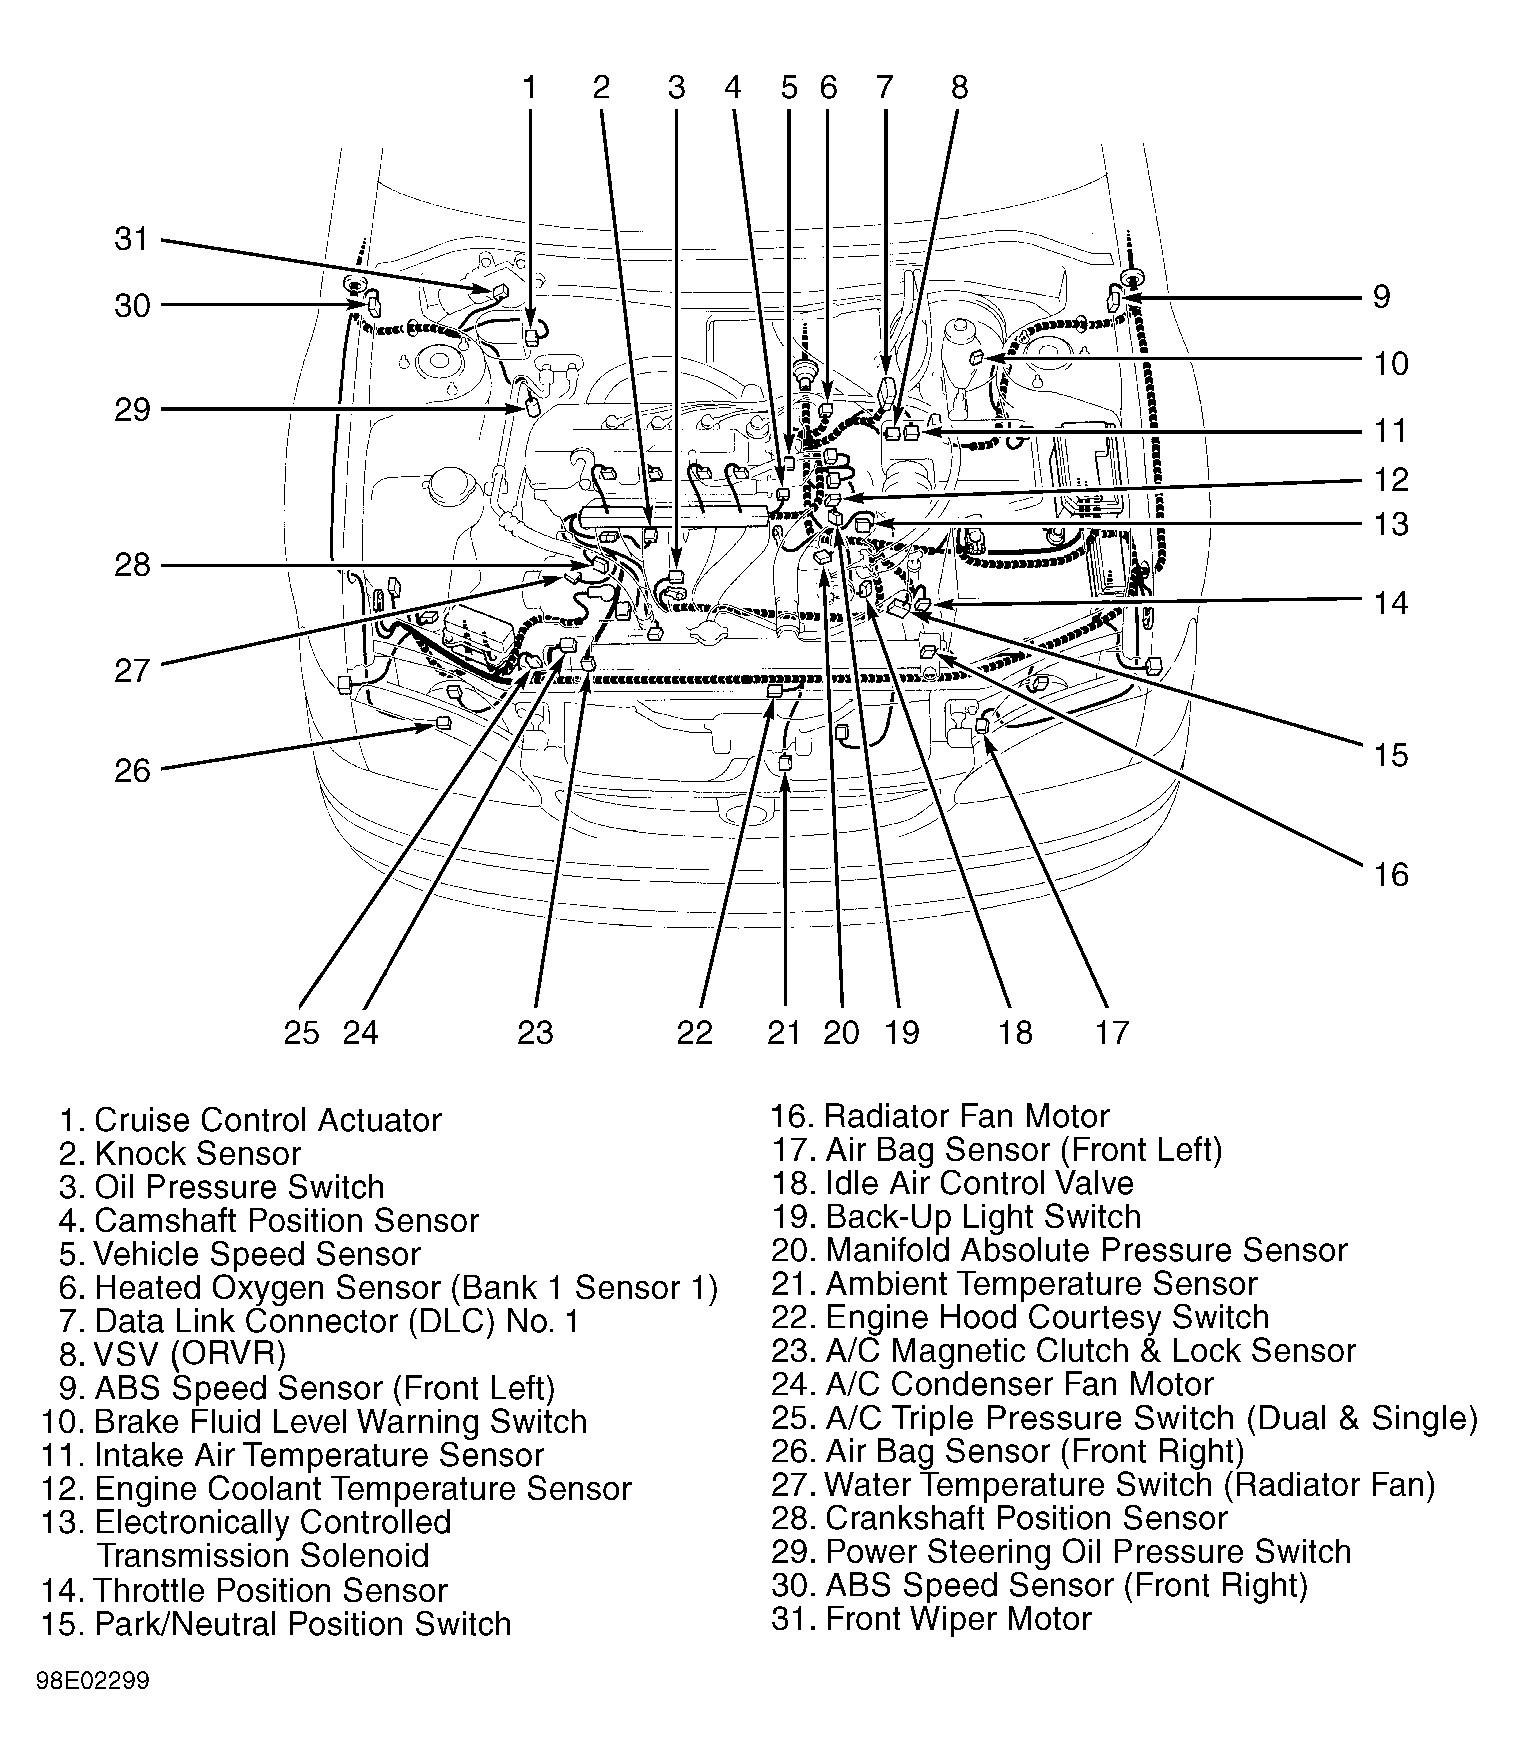 1990 toyota Camry Engine Diagram 1995 toyota Corolla Engine Diagram Heater Wiring Diagram Used Of 1990 toyota Camry Engine Diagram